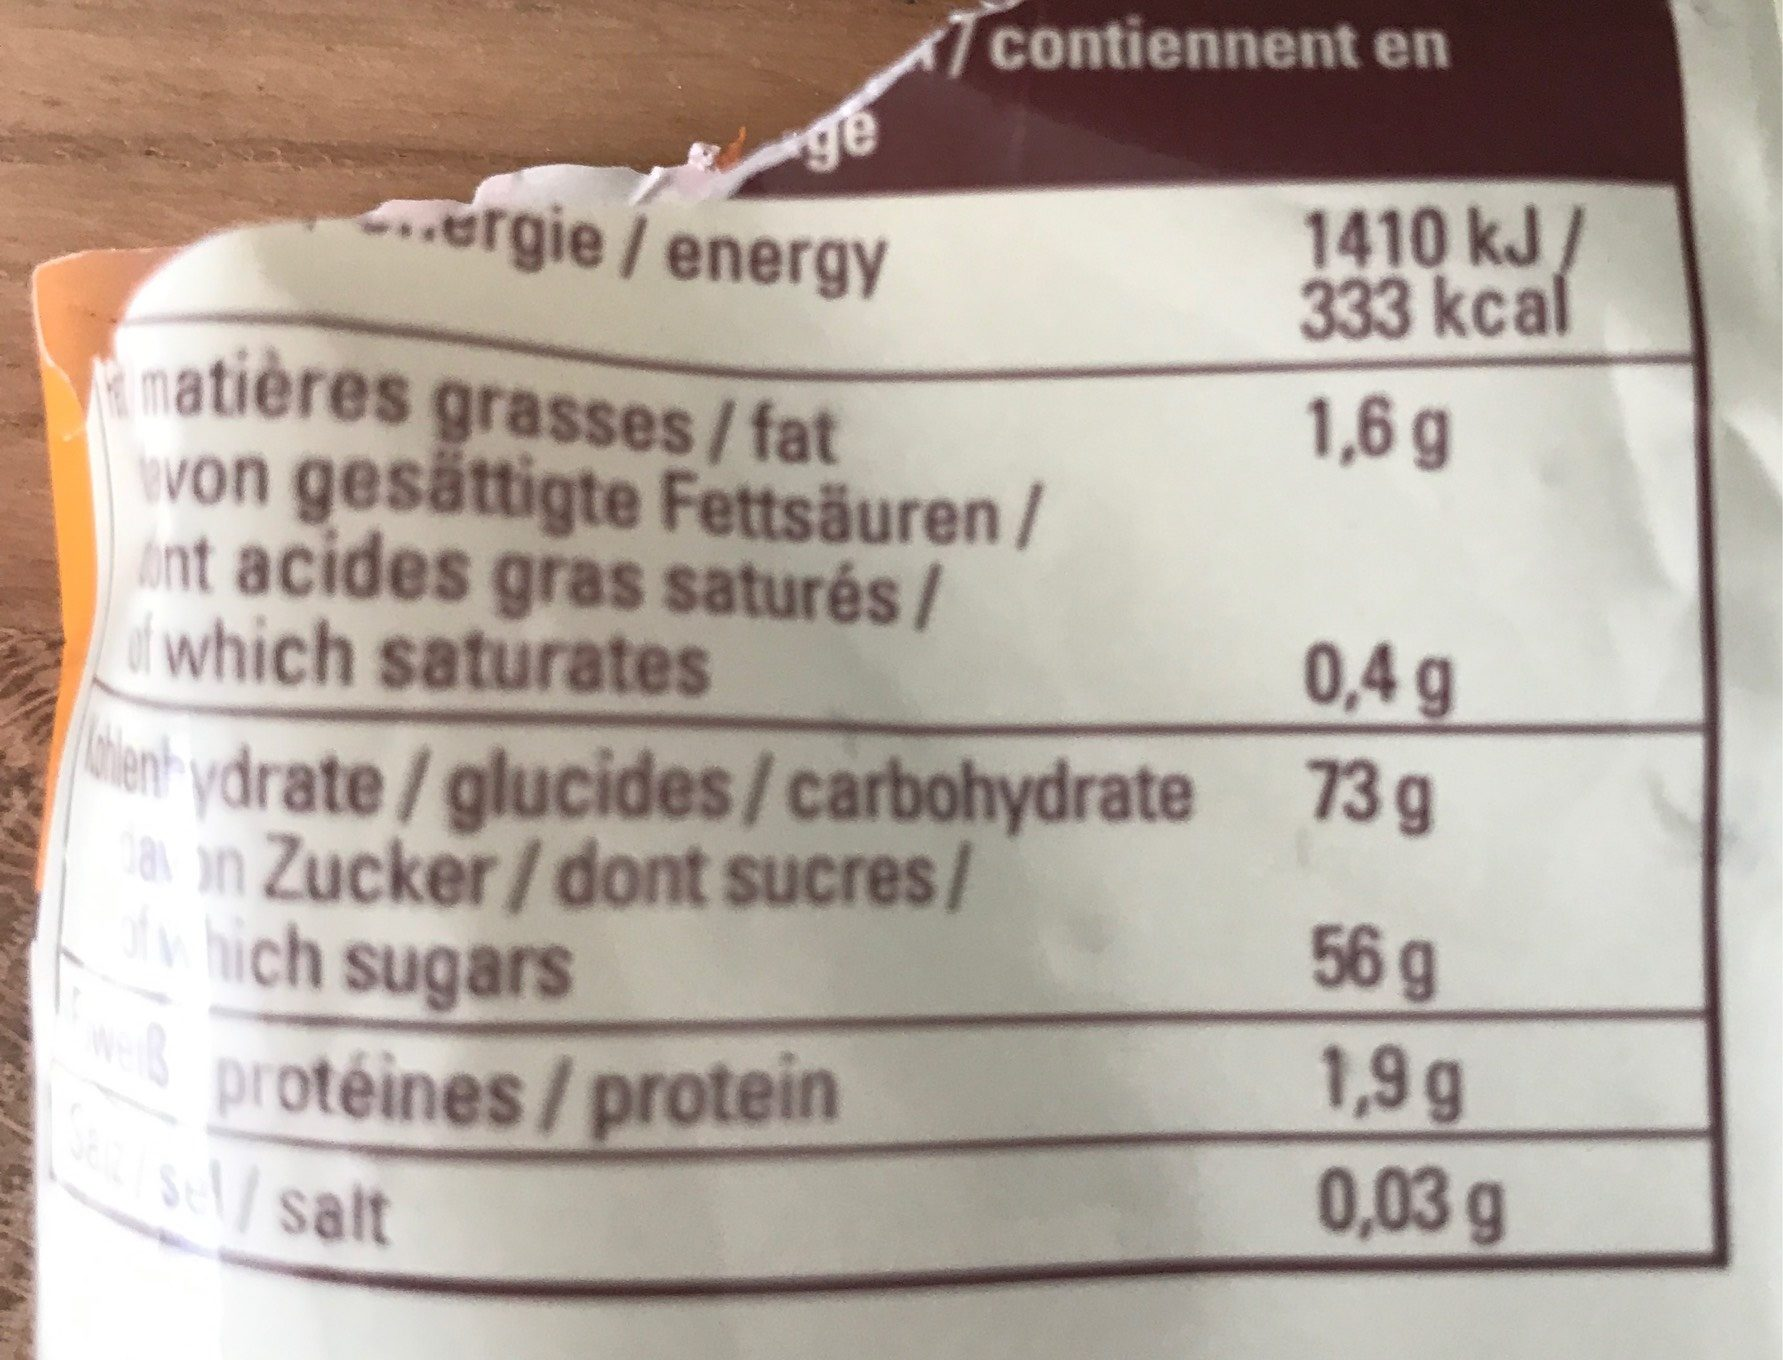 Superfrucht Sélection - Nutrition facts